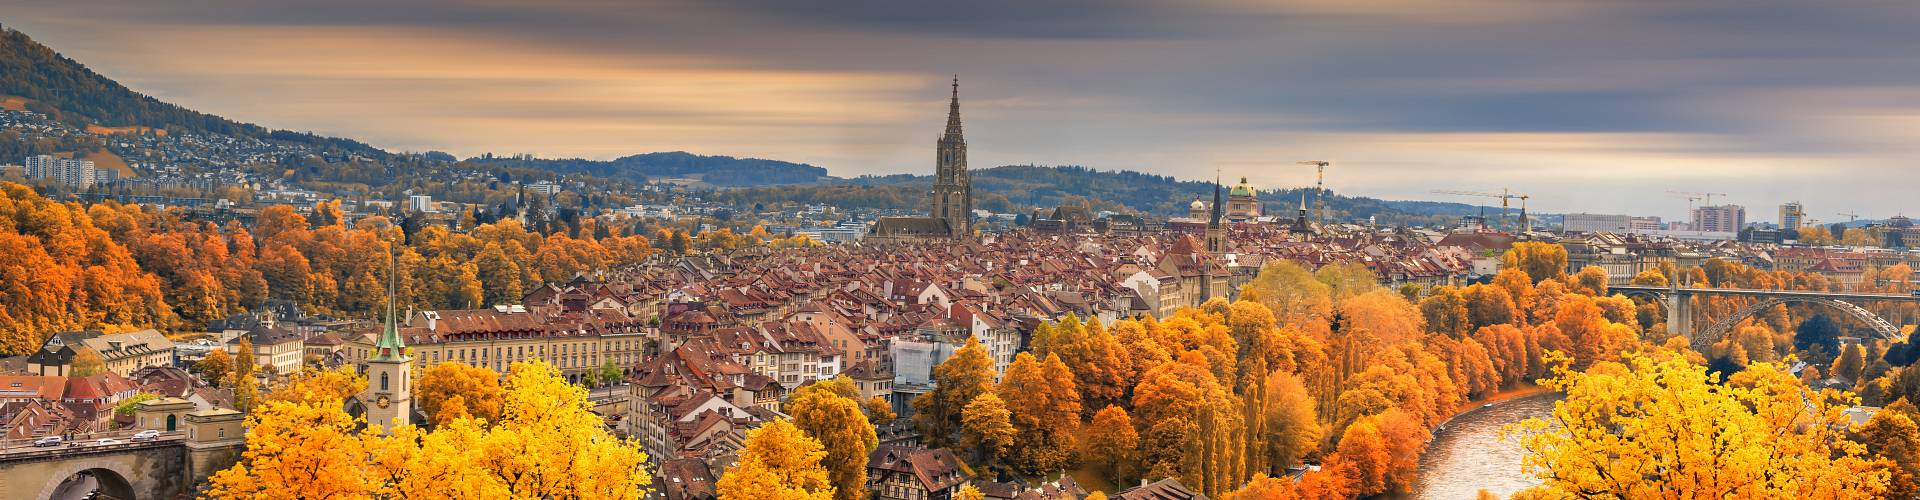 RE/MAX – no. 1 for real estate in Switzerland © Freepik